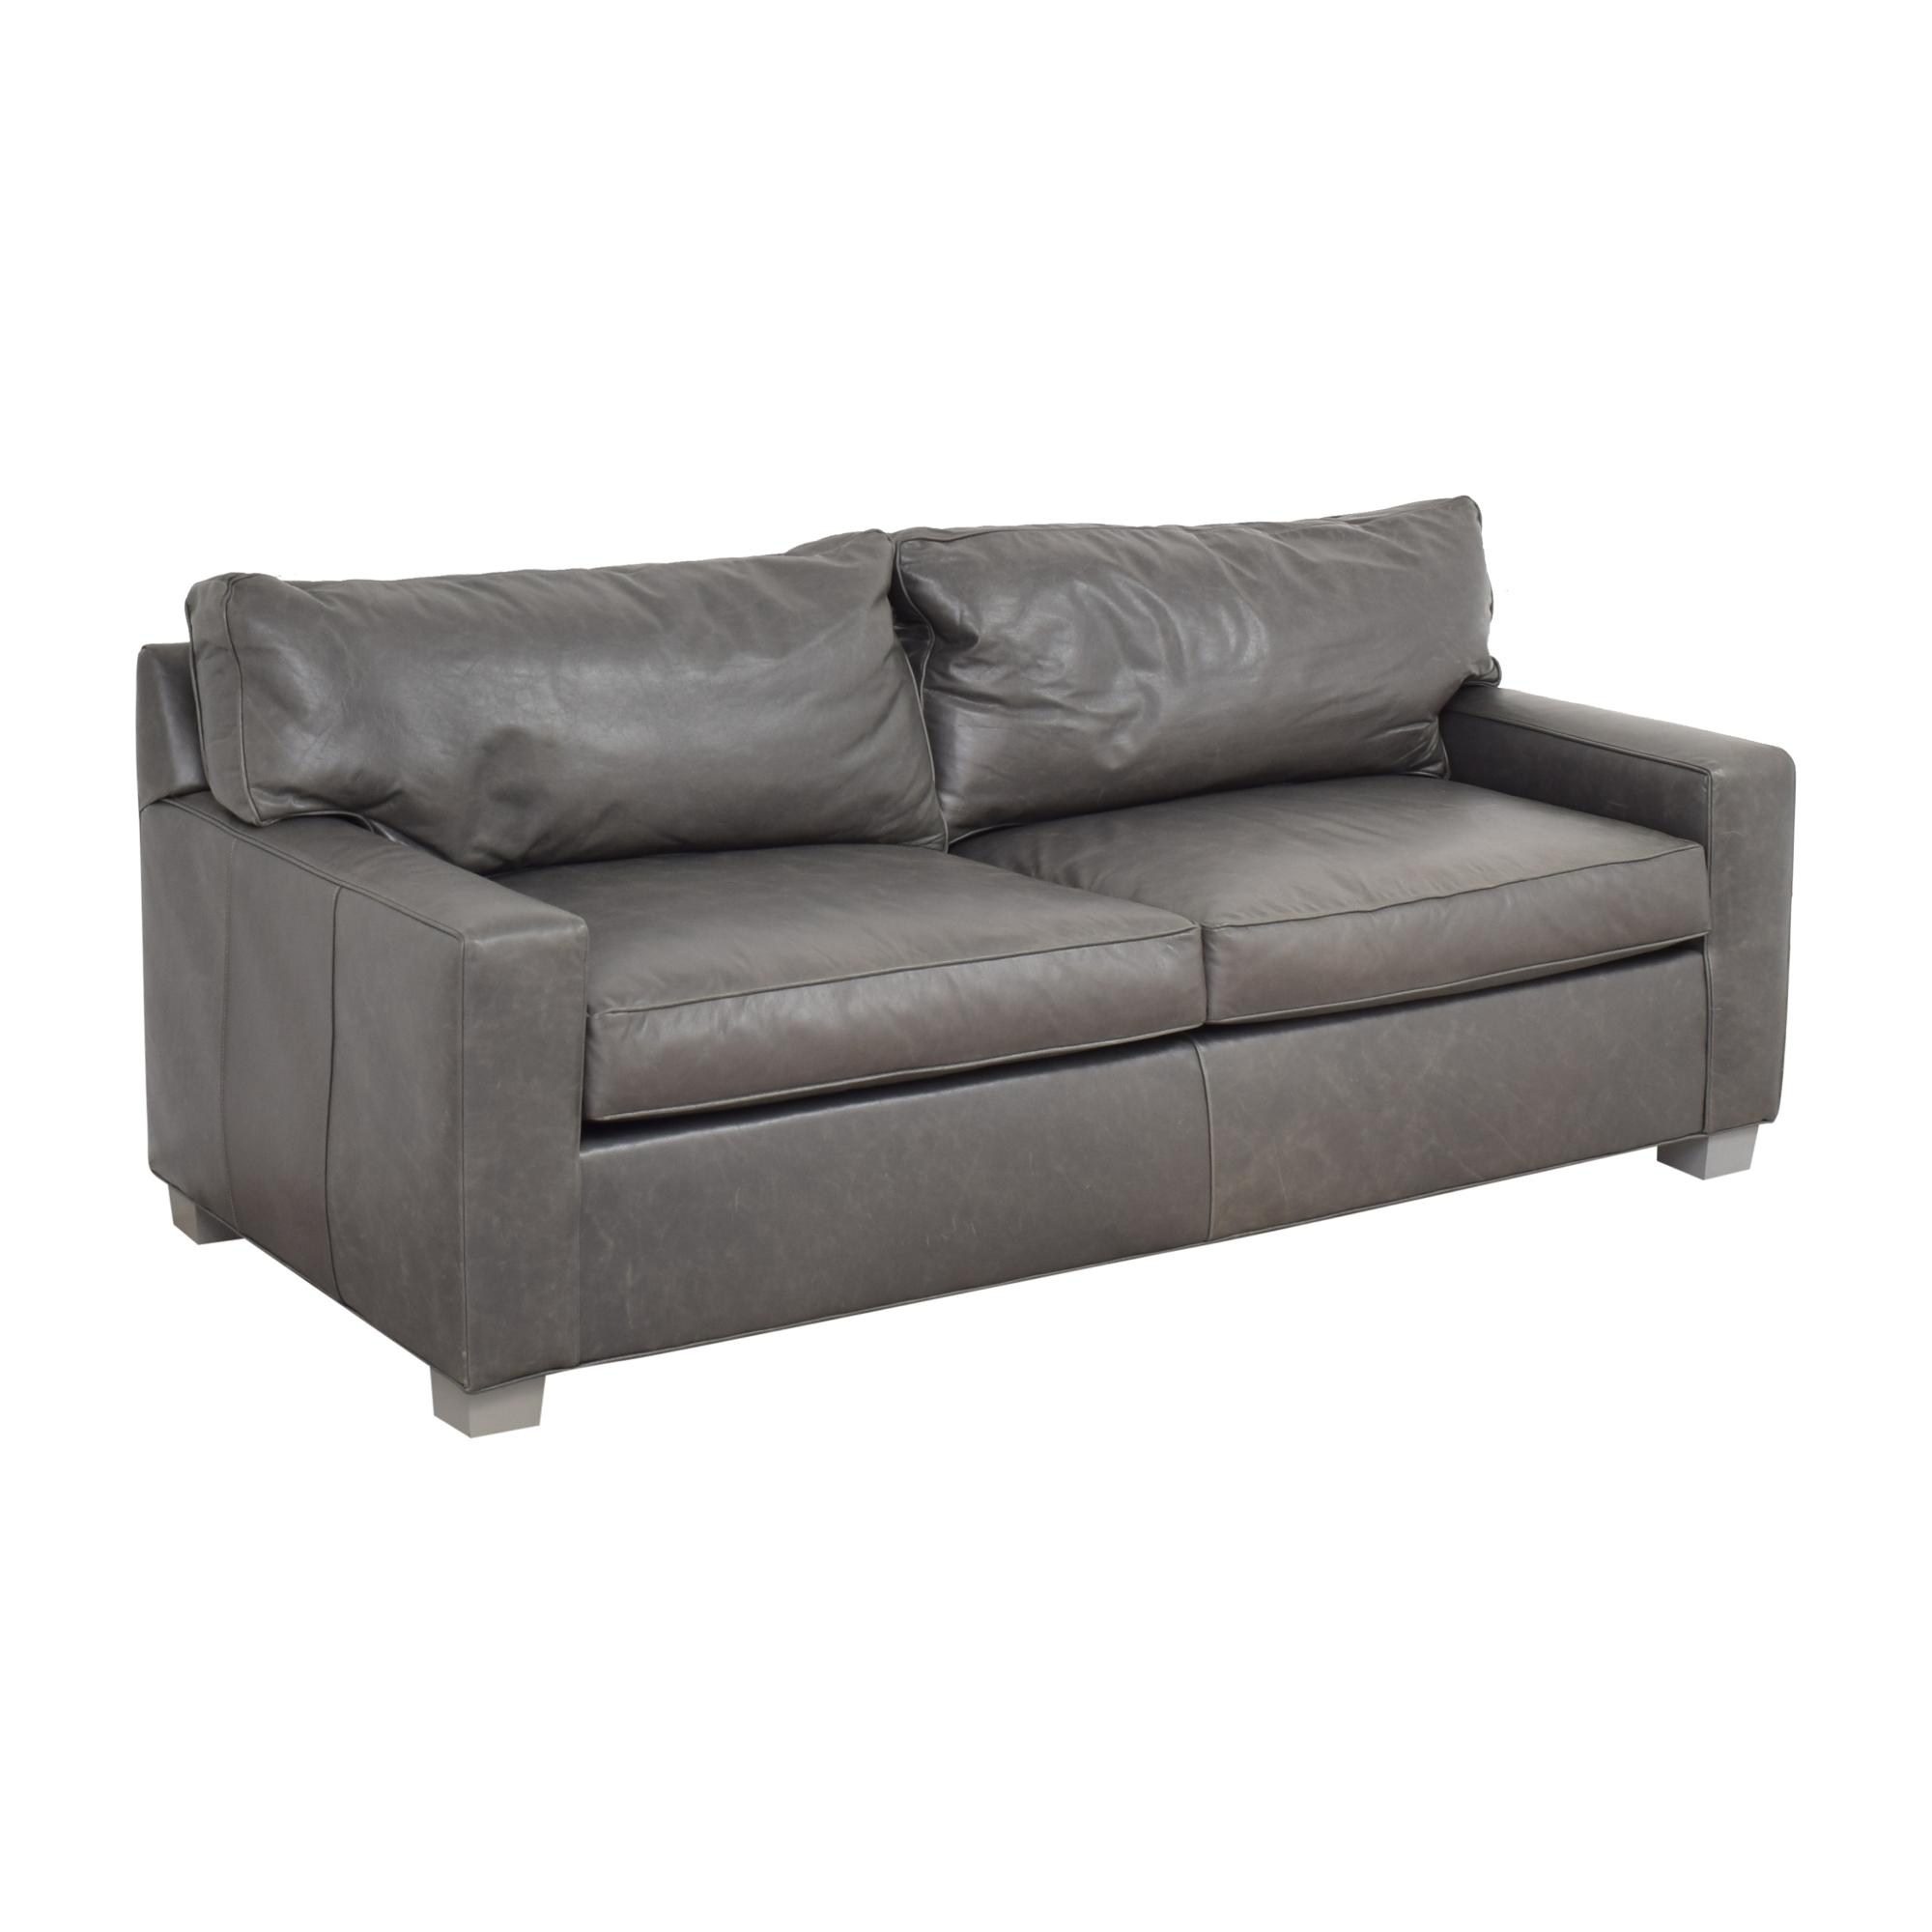 Mitchell Gold + Bob Williams Mitchell Gold + Bob Williams Alex Two Cushion Sofa nyc